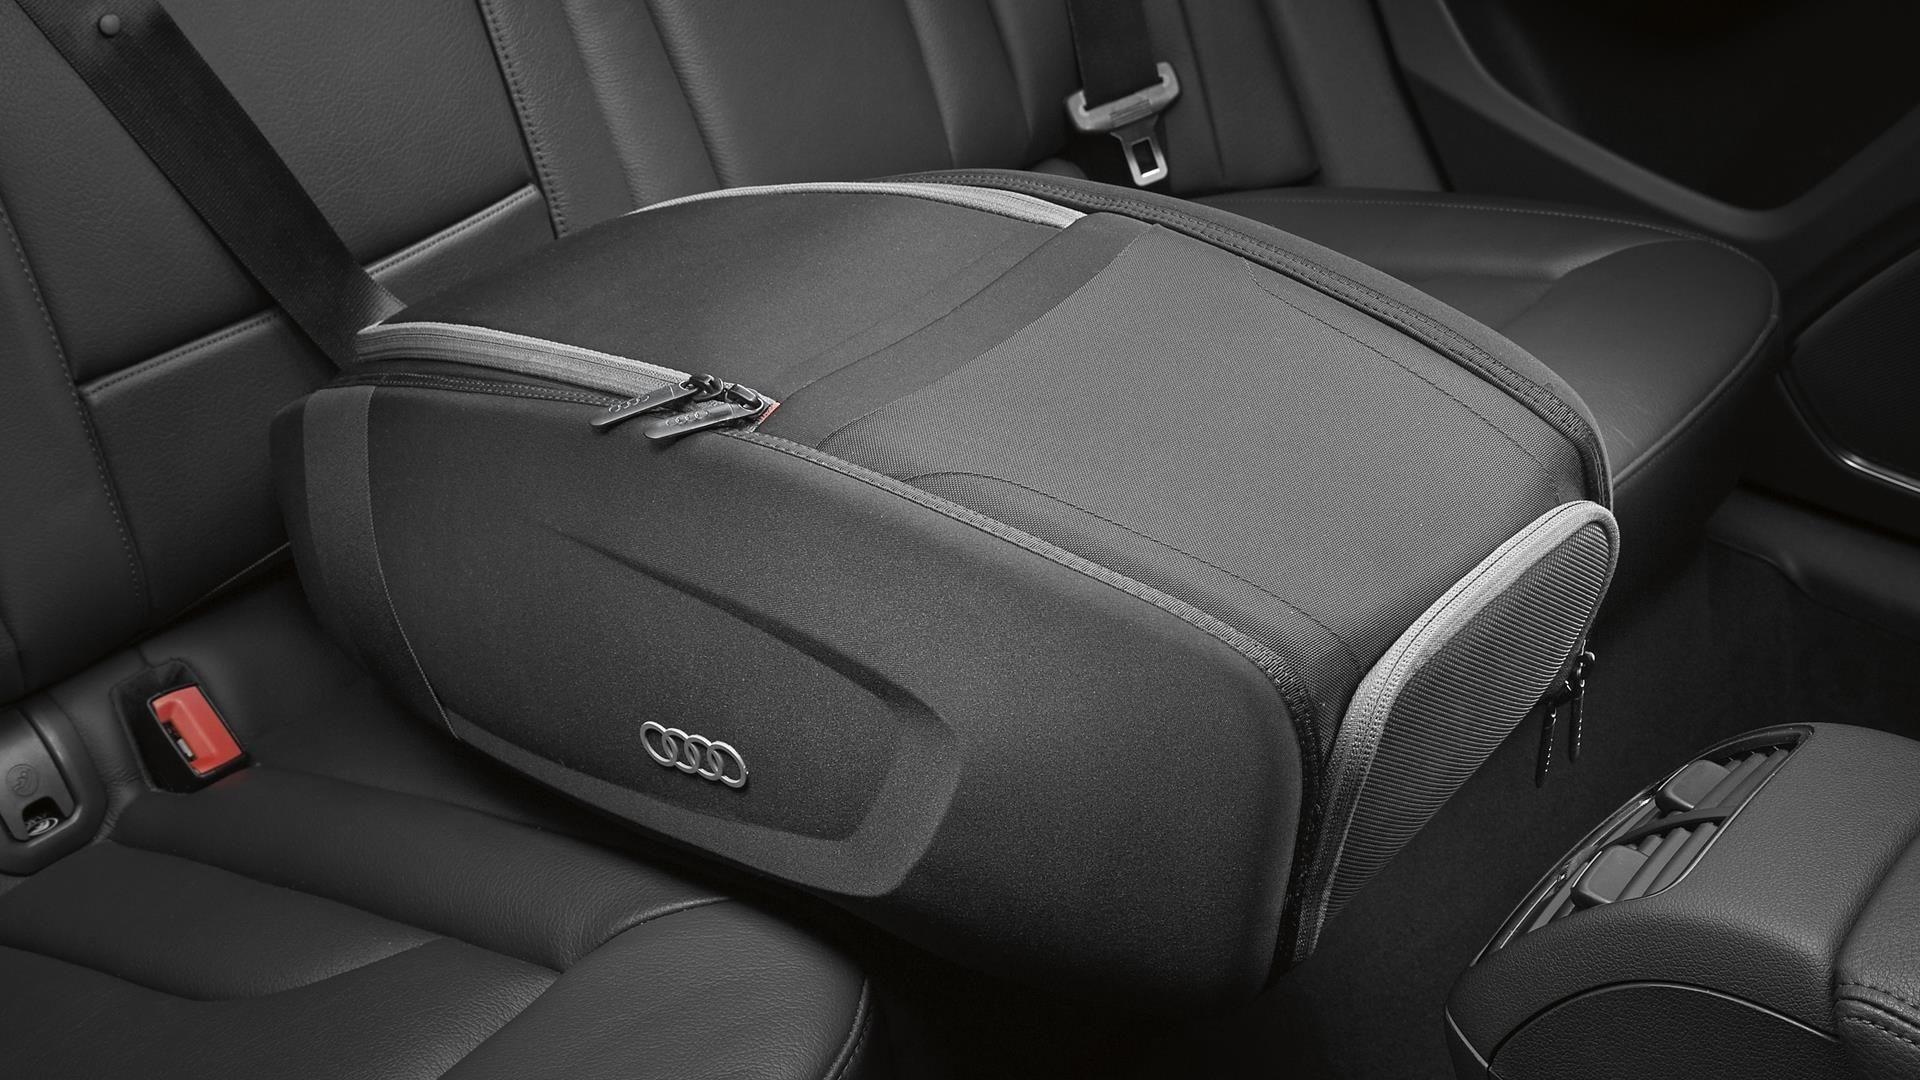 2017 Audi Q7 Rear Storage Bag 000061100h Genuine Audi Accessory Audi Accessories Bag Storage Audi